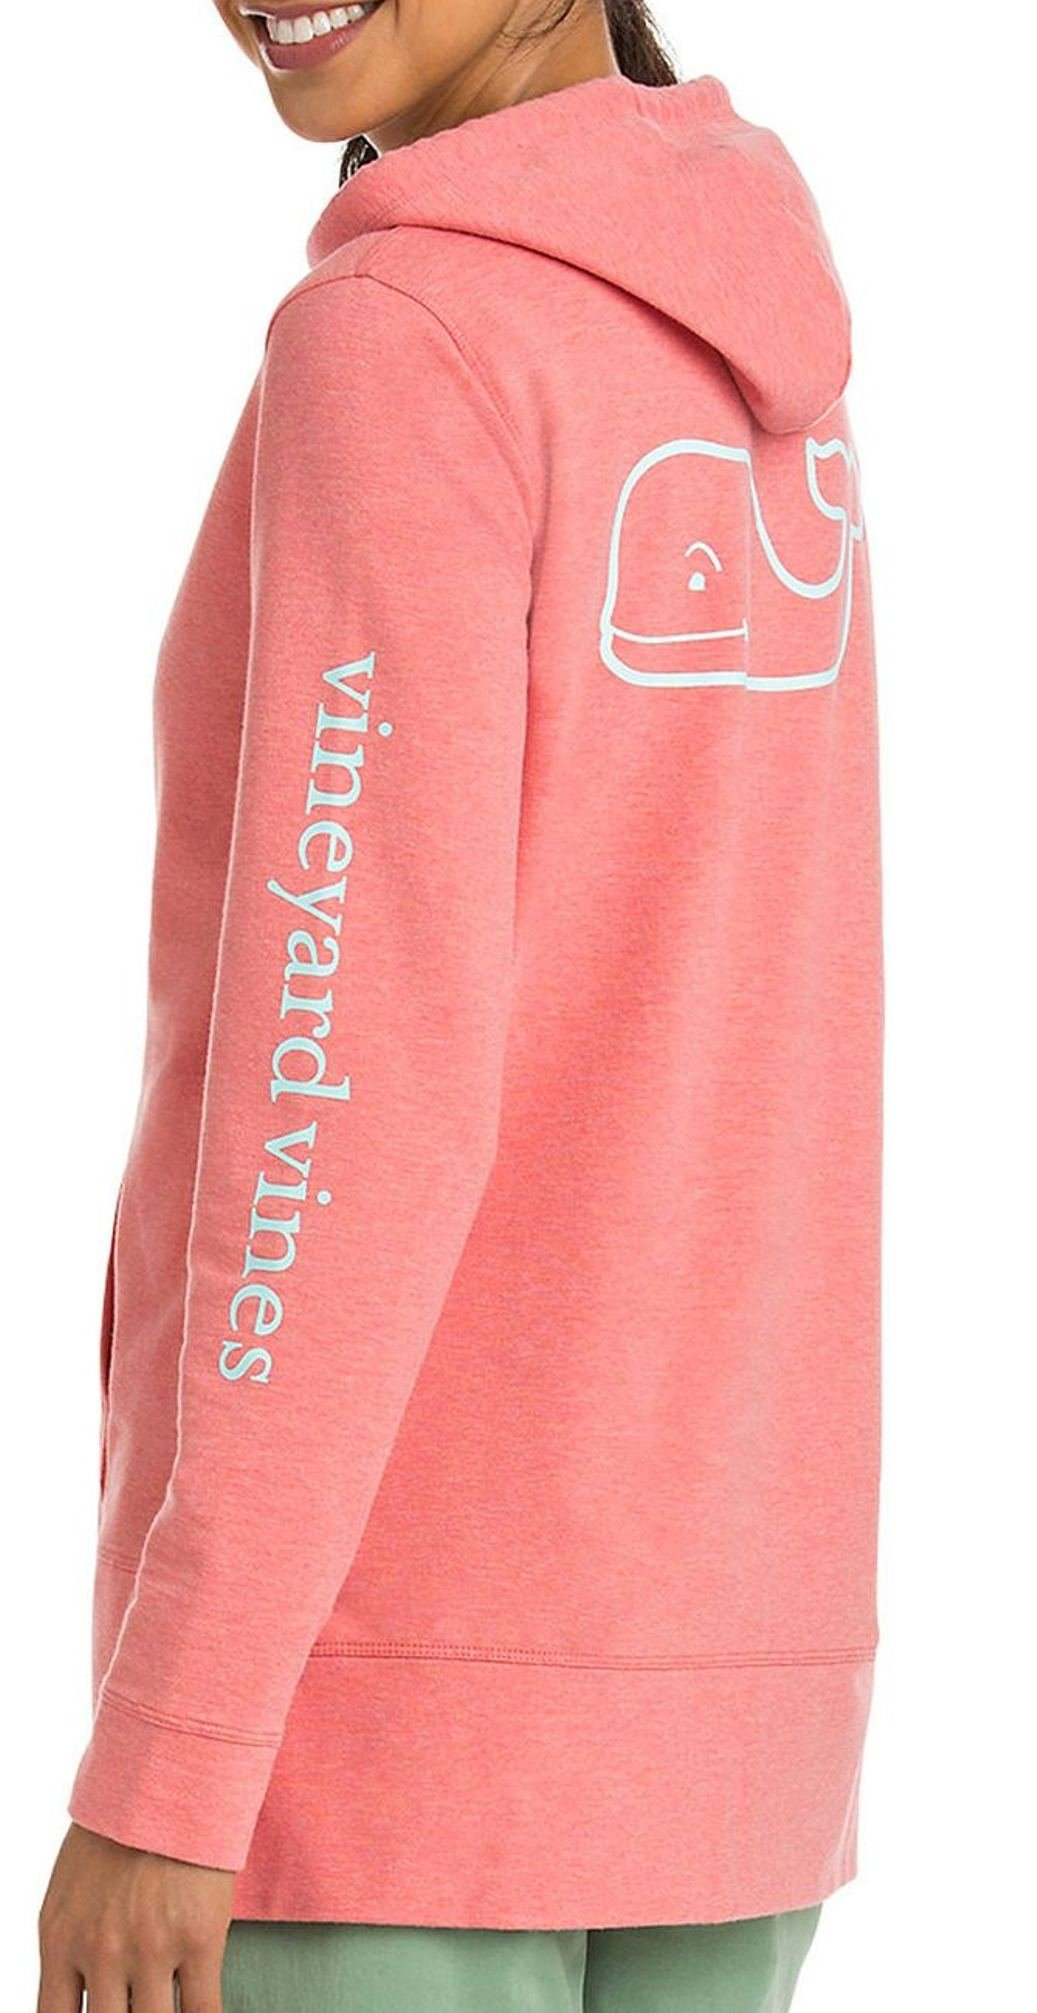 Vineyard Vines Womens LS Whale French Terry Hoodie Sweatshirt 2K1118-662 Blush (Small) by Vineyard-Vines Clothing